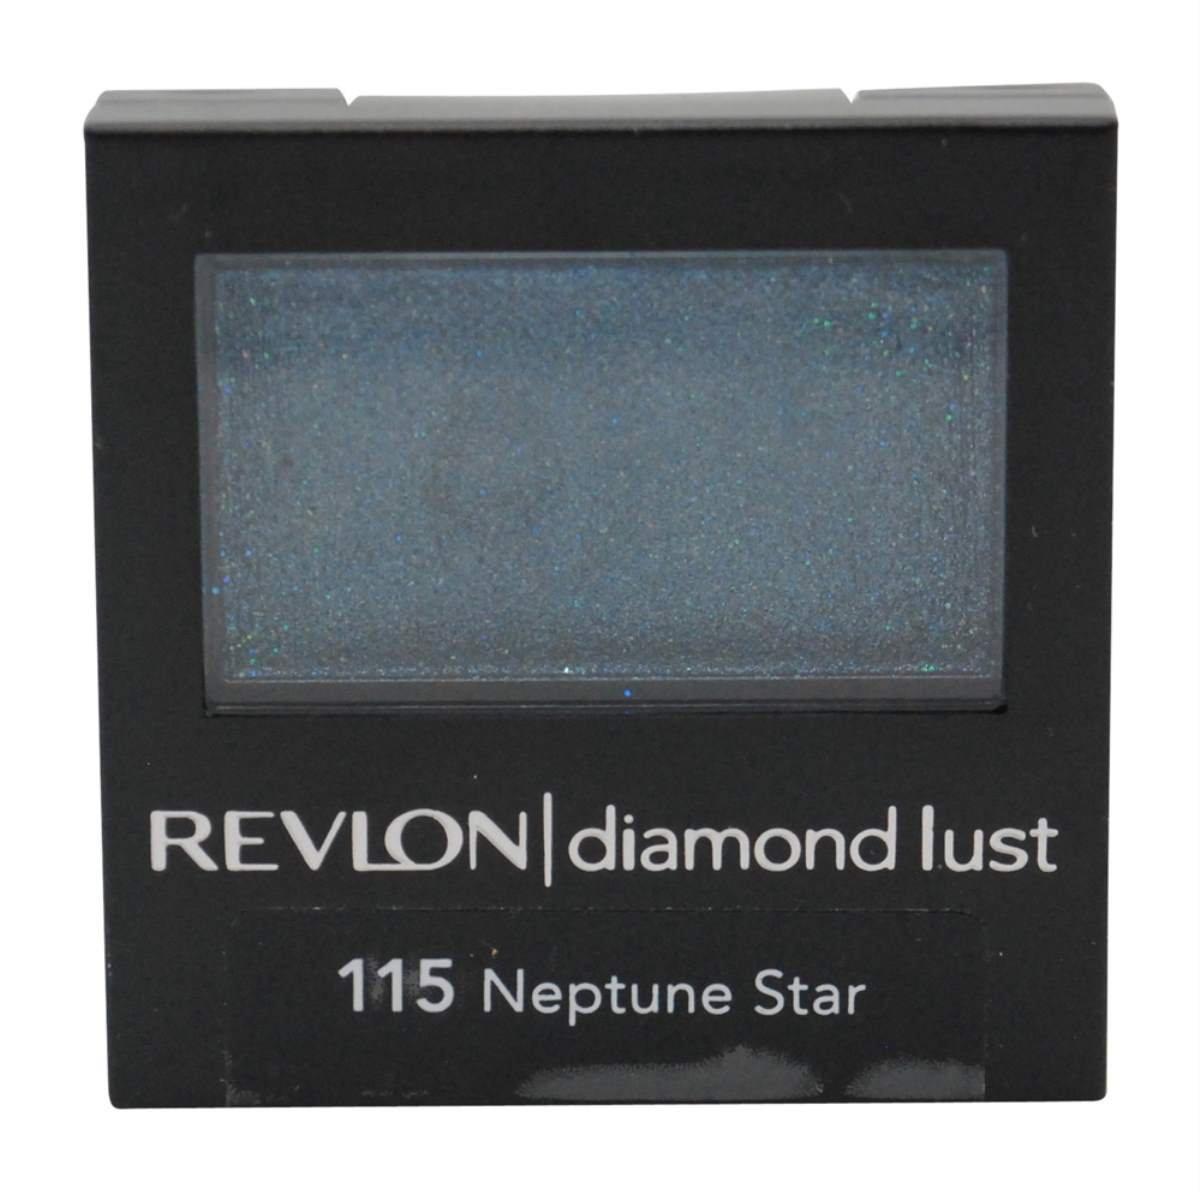 3 Pack- Revlon Luxurious Color Diamond Lust Eye Shadow #115 Neptune Star